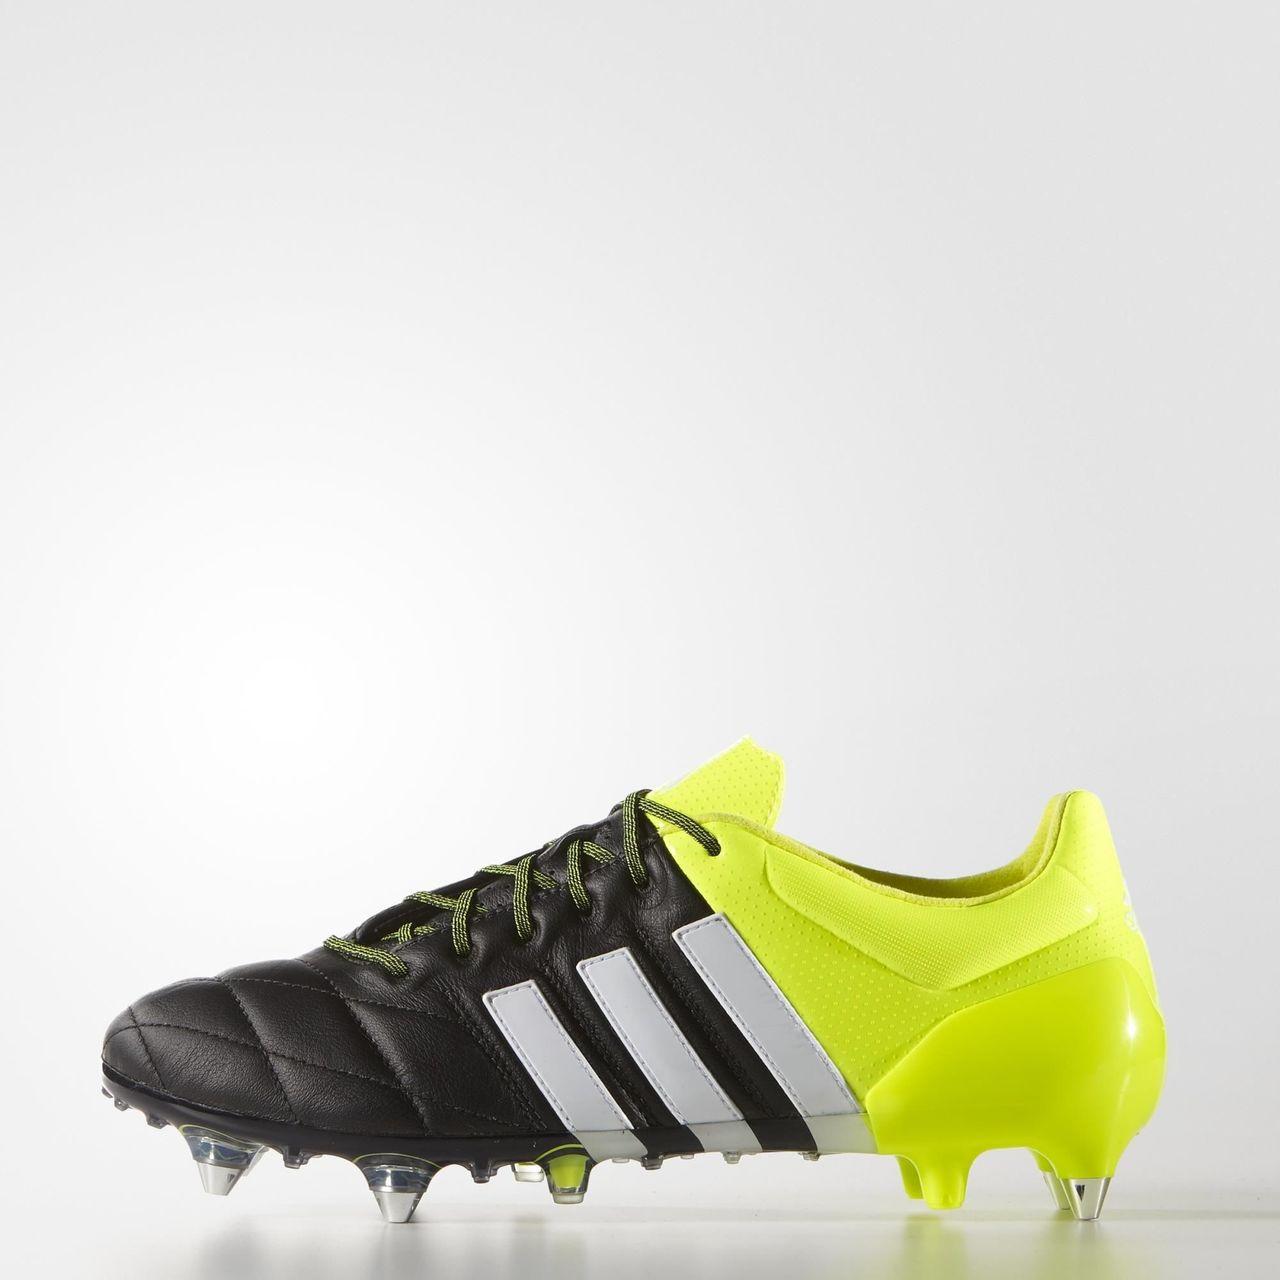 sports shoes 5580e d860b Adidas Ace15.1 SG Boots - Core Black / White / Solar Yellow ...